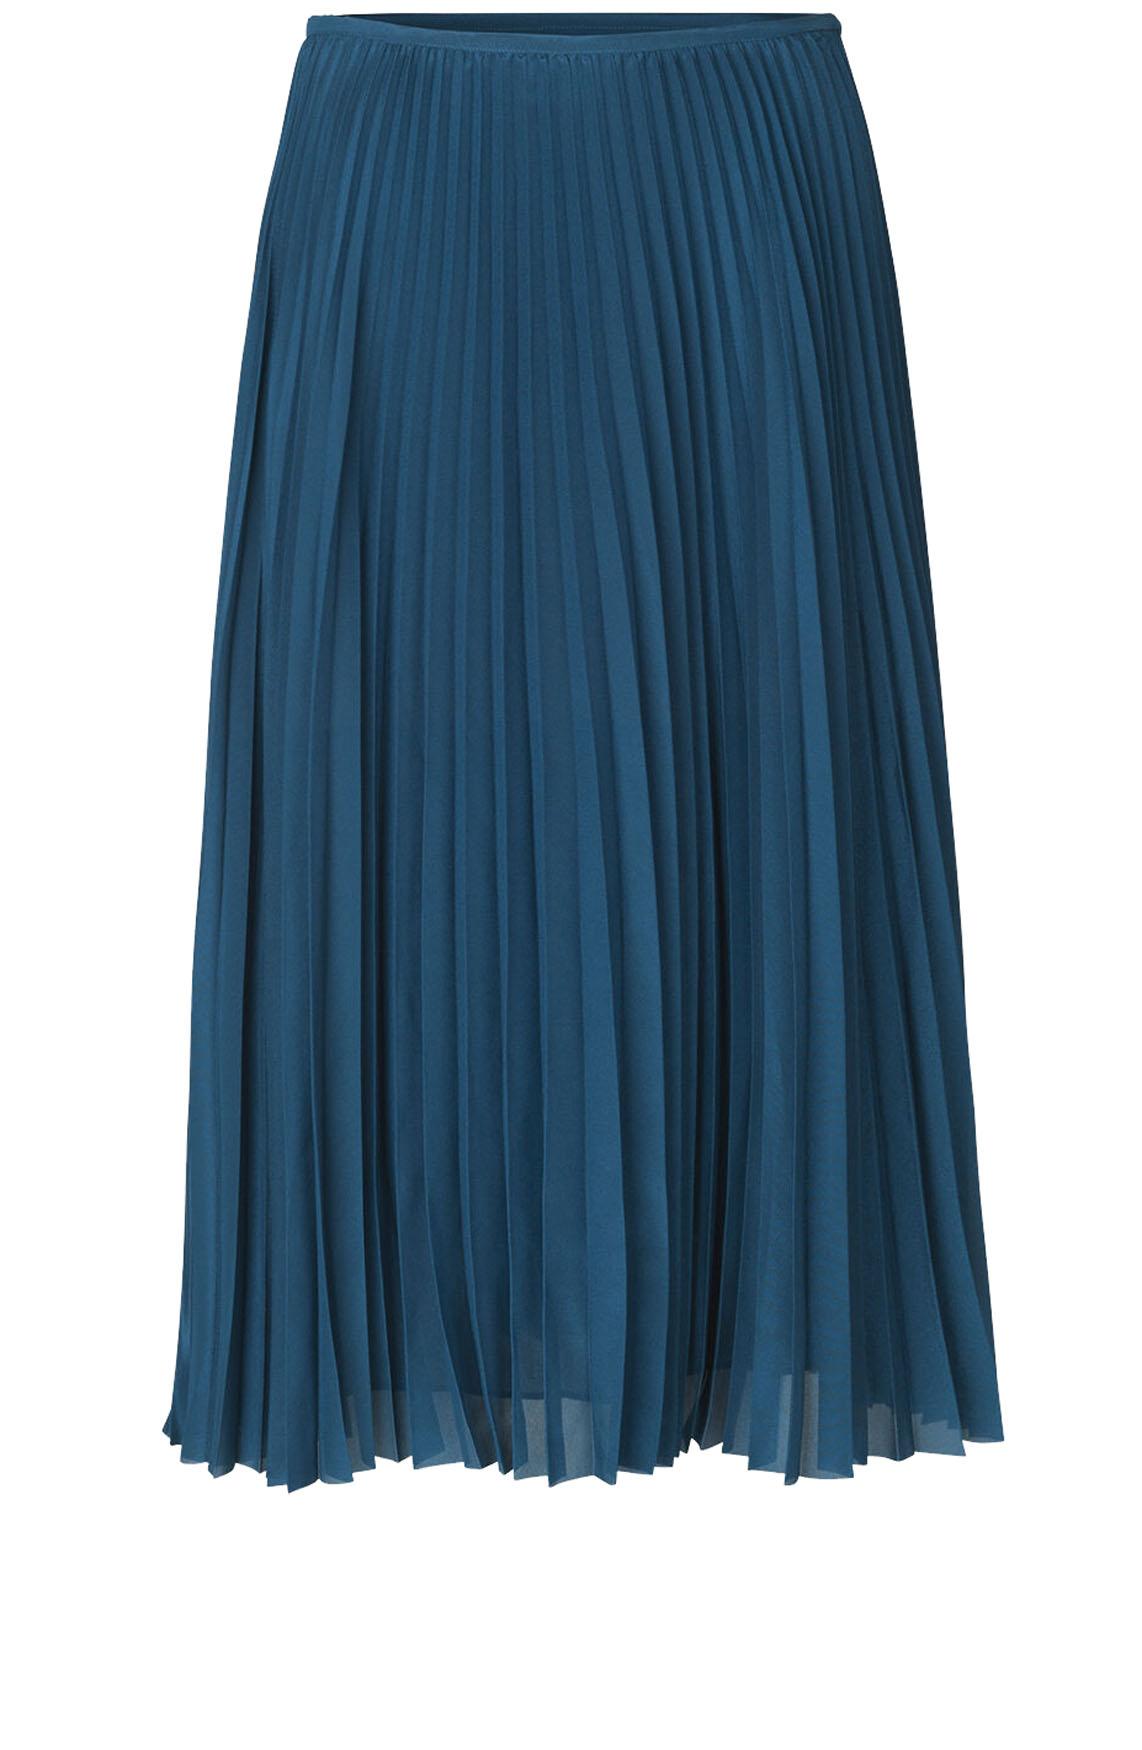 Samsoe Samsoe Dames Juliette plissé rok Blauw